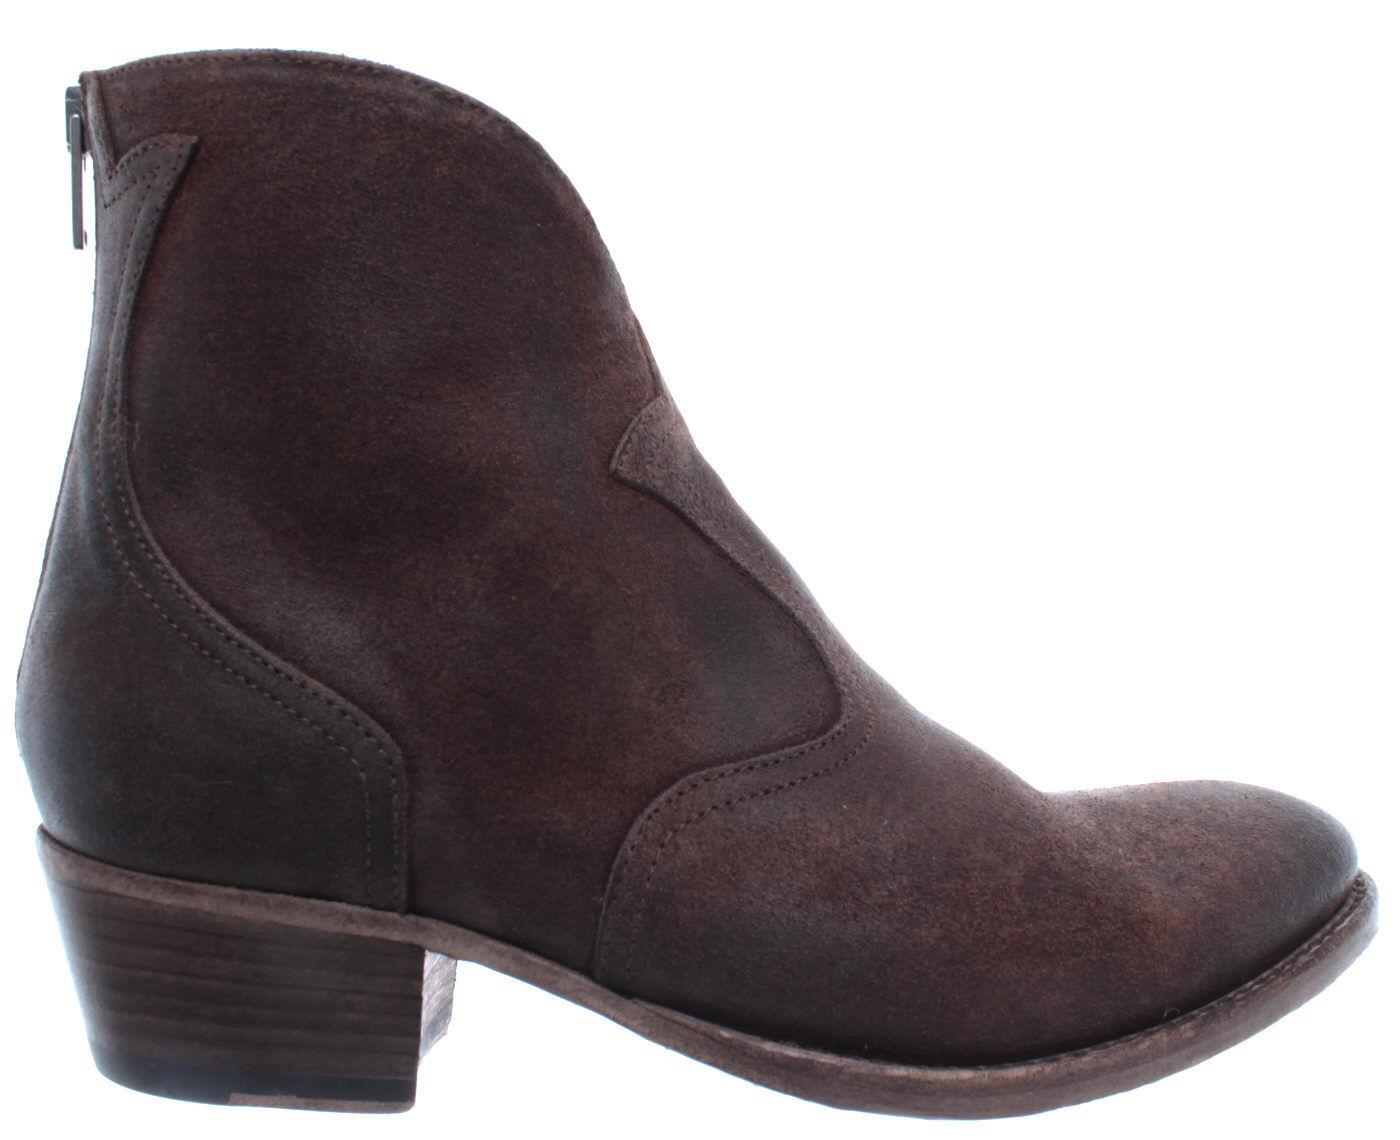 PANTANETTI 12162B Roser Martora marron chaussures Tronchetto femmes  Nuove Nuove Nuove c1dc8c